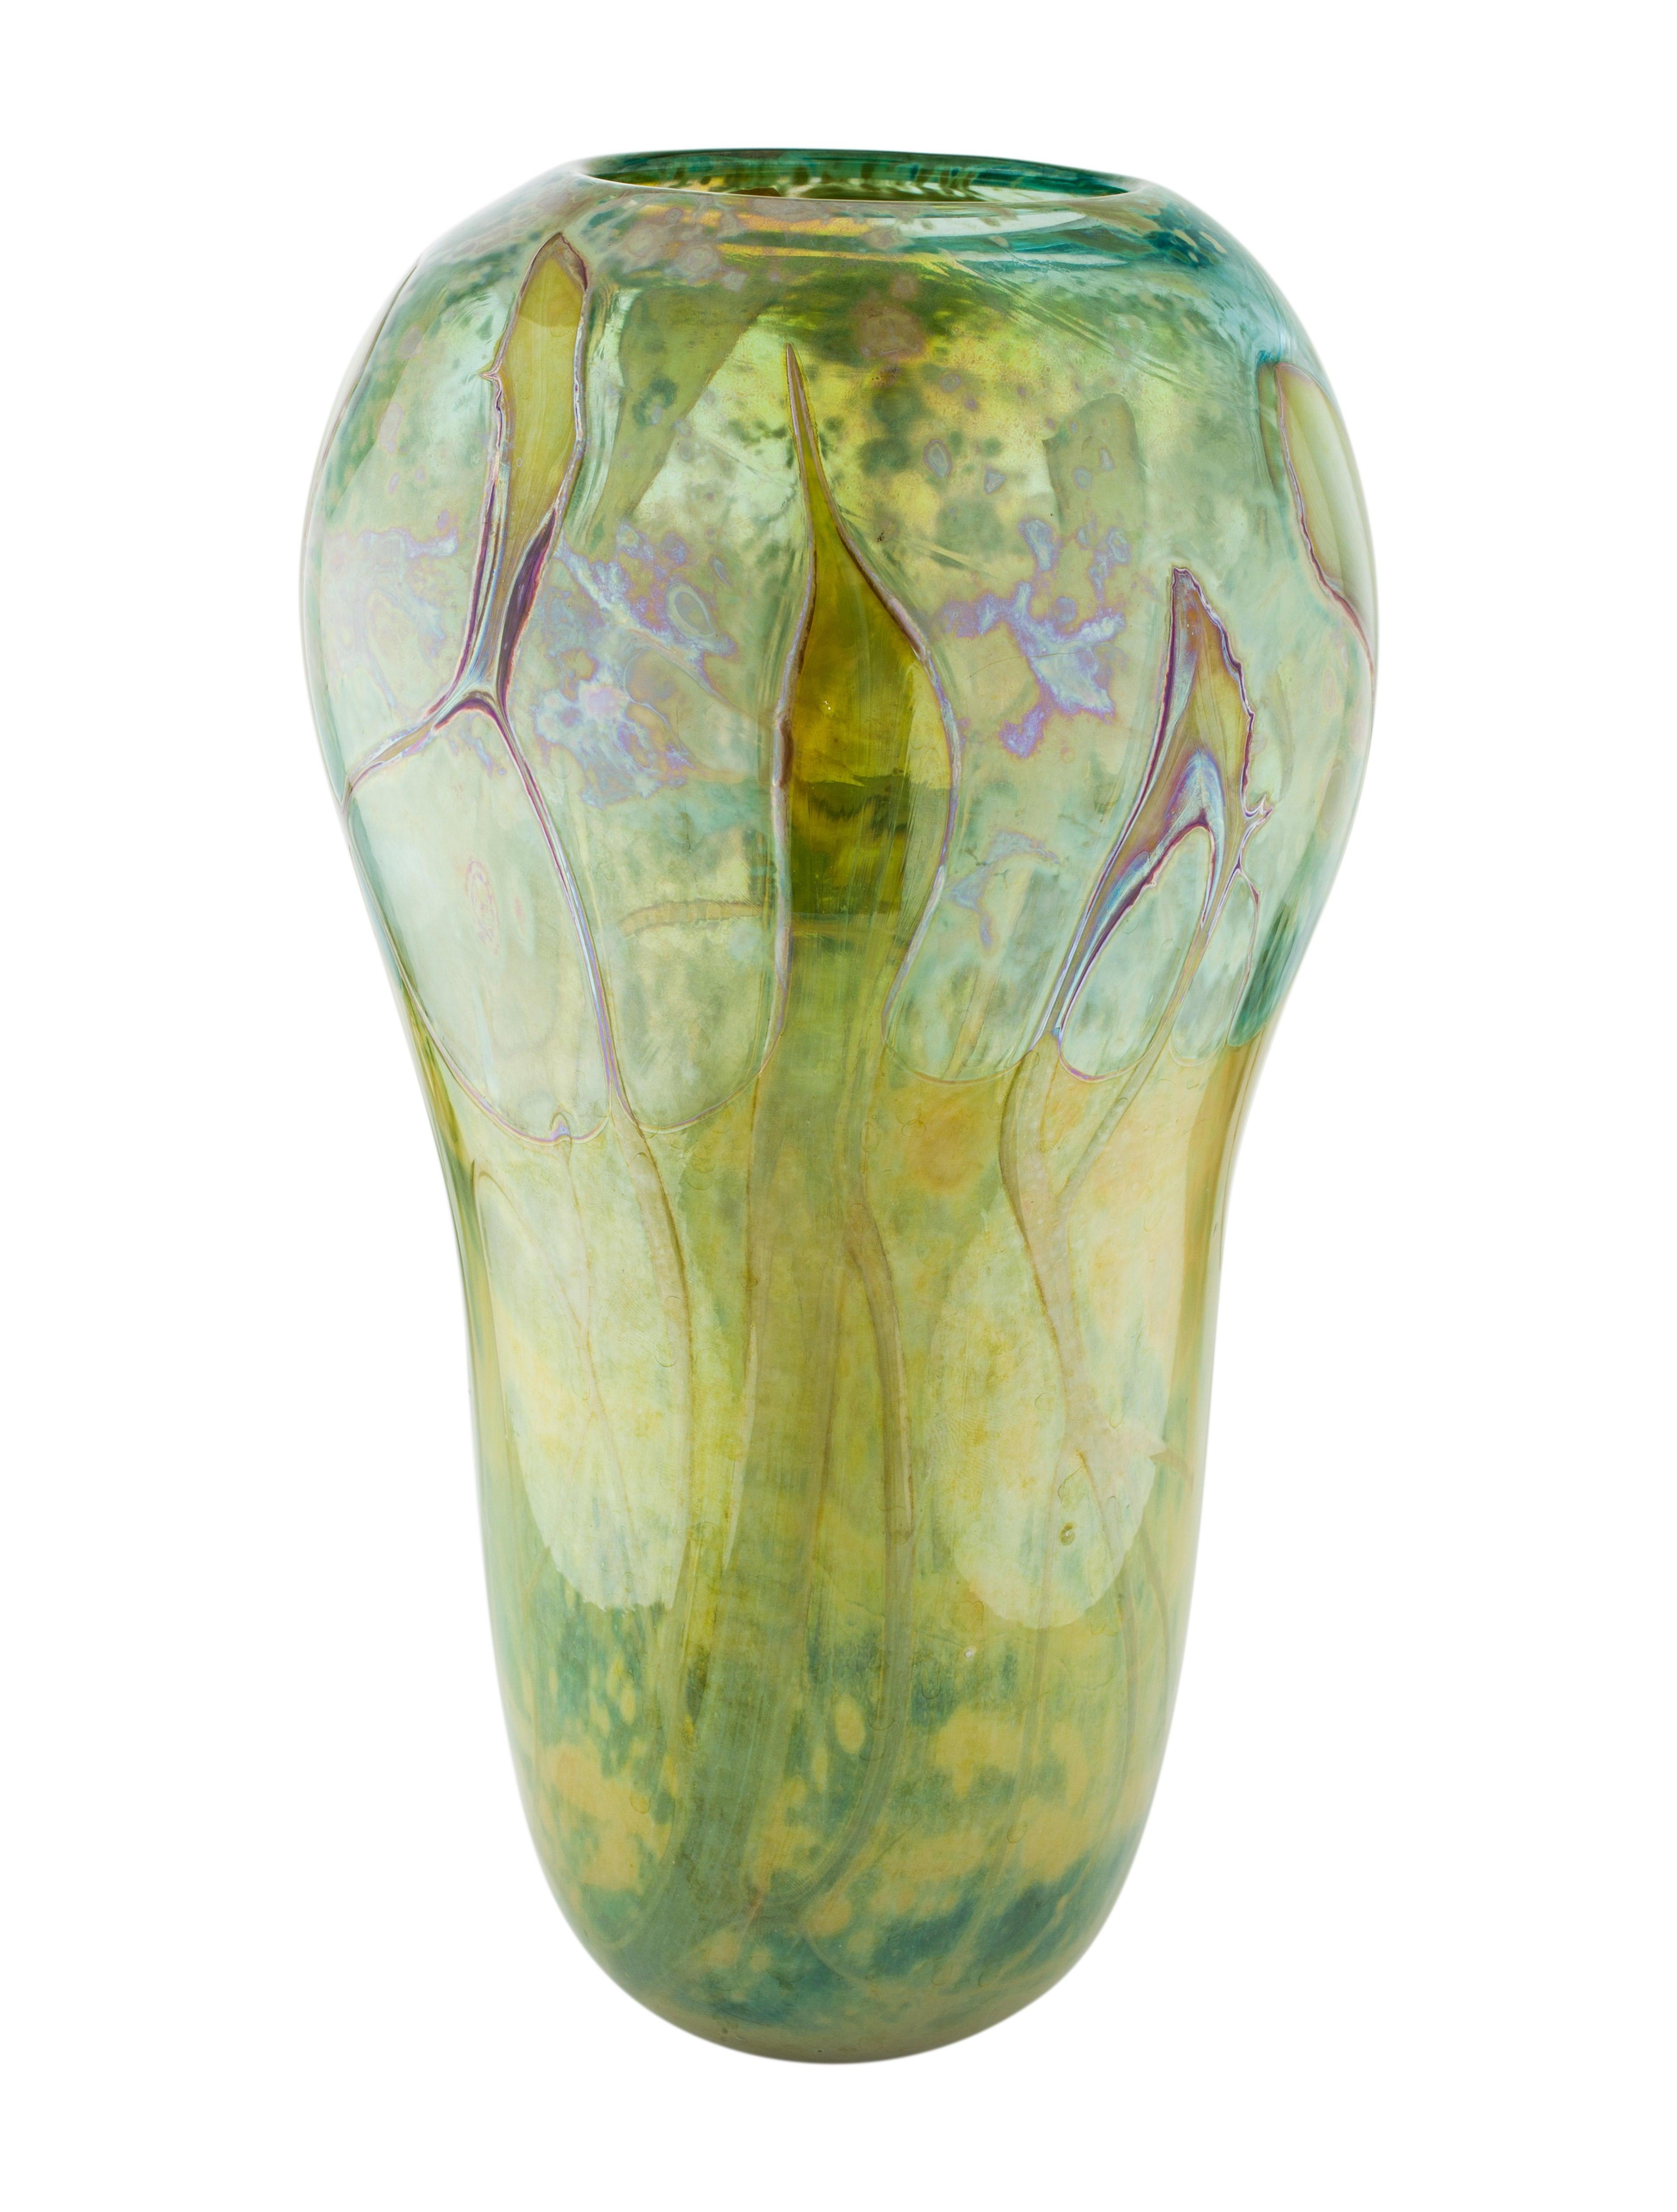 Glass Vase Holiday Decor